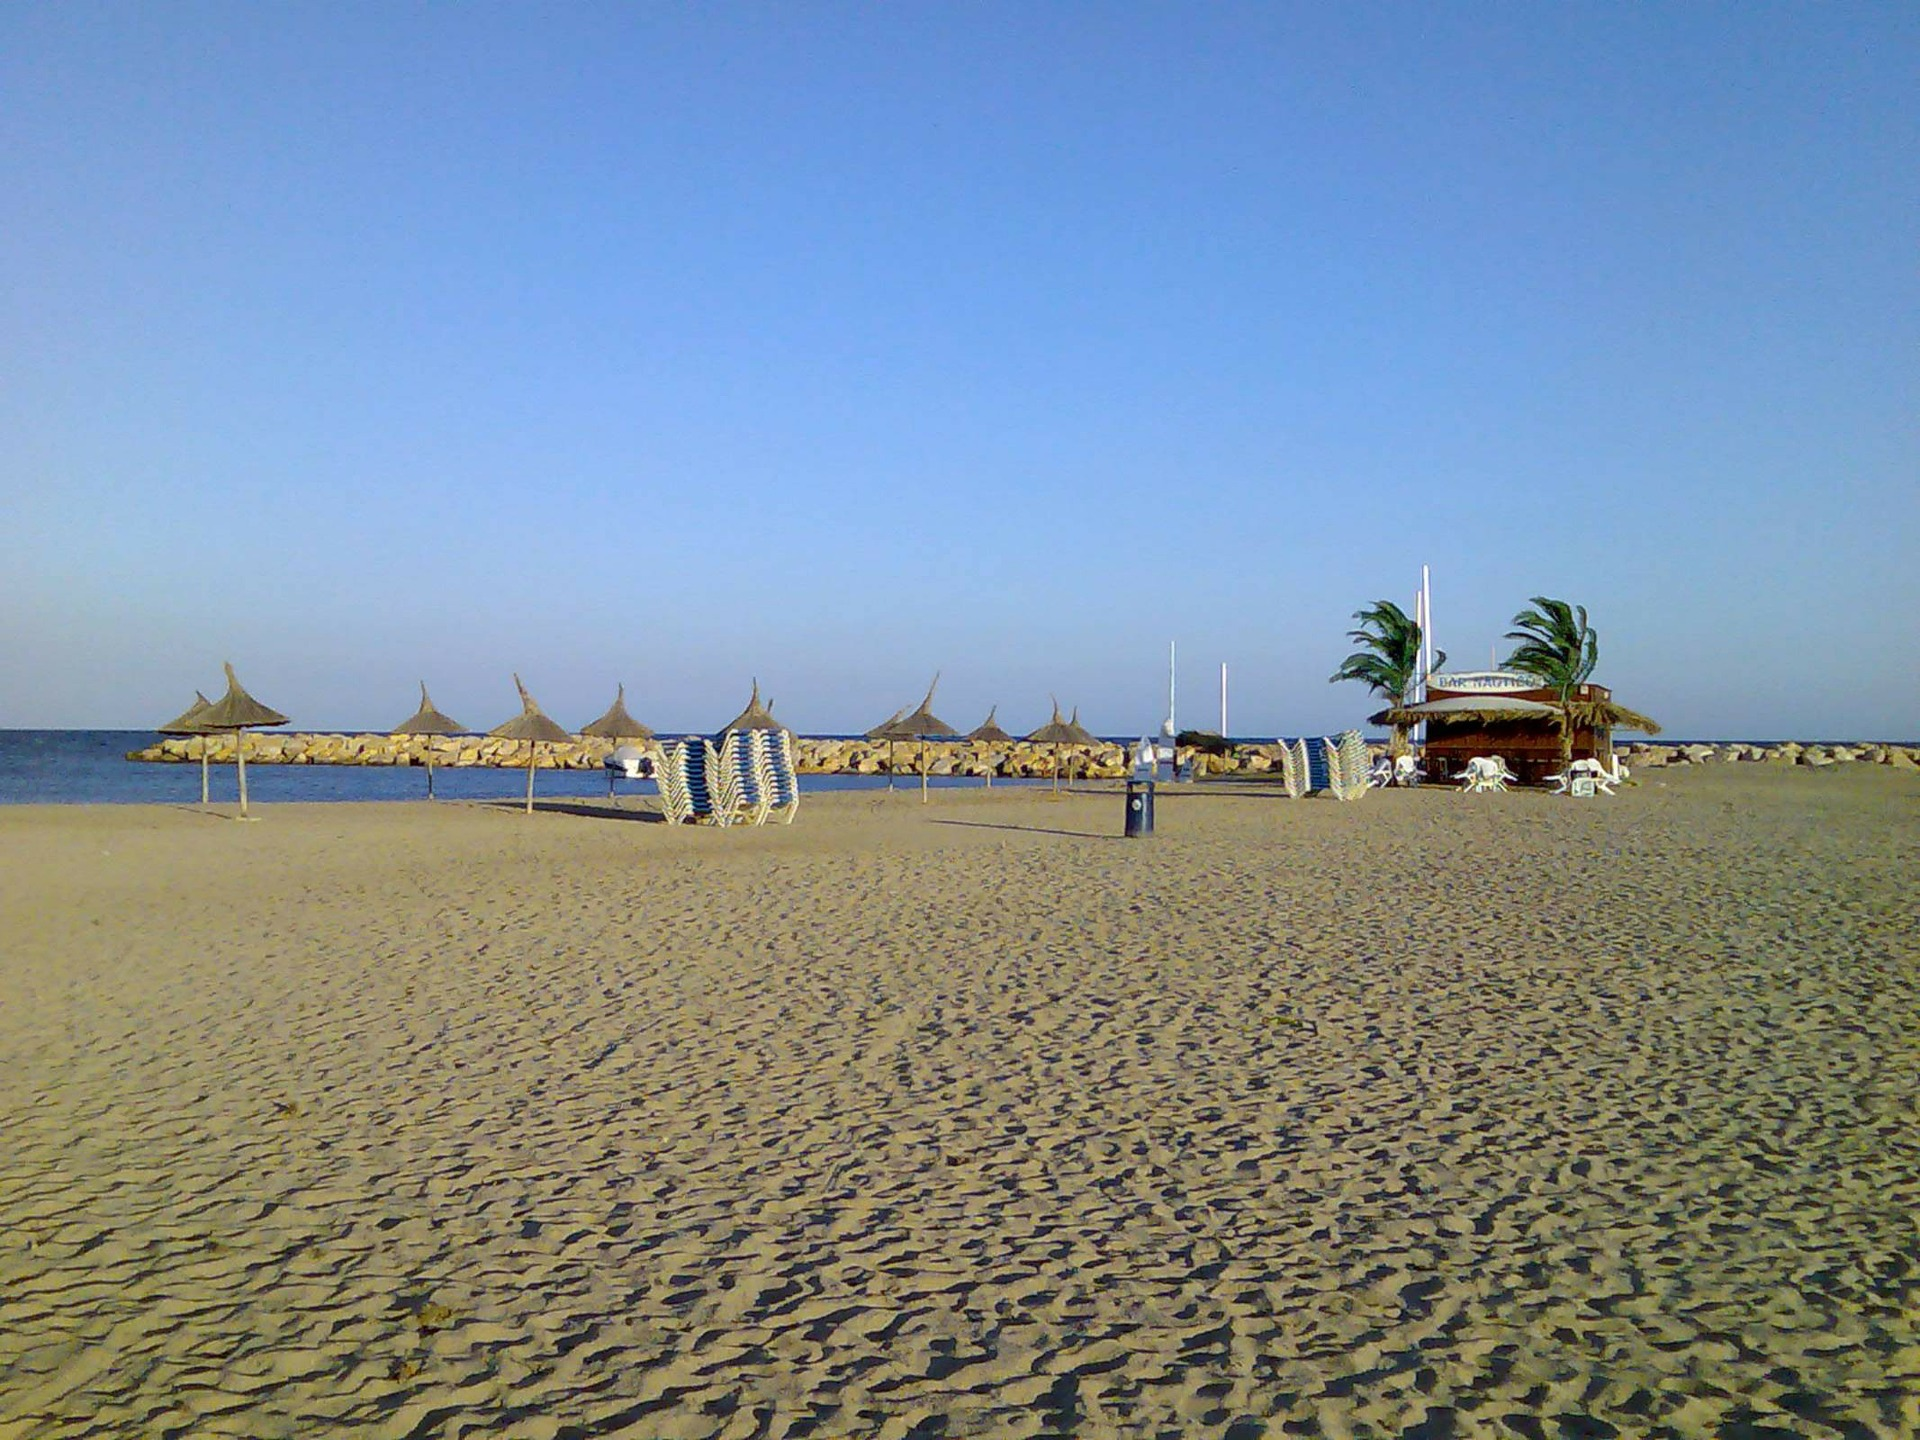 schöner Sandstrand an der Costa Daurada